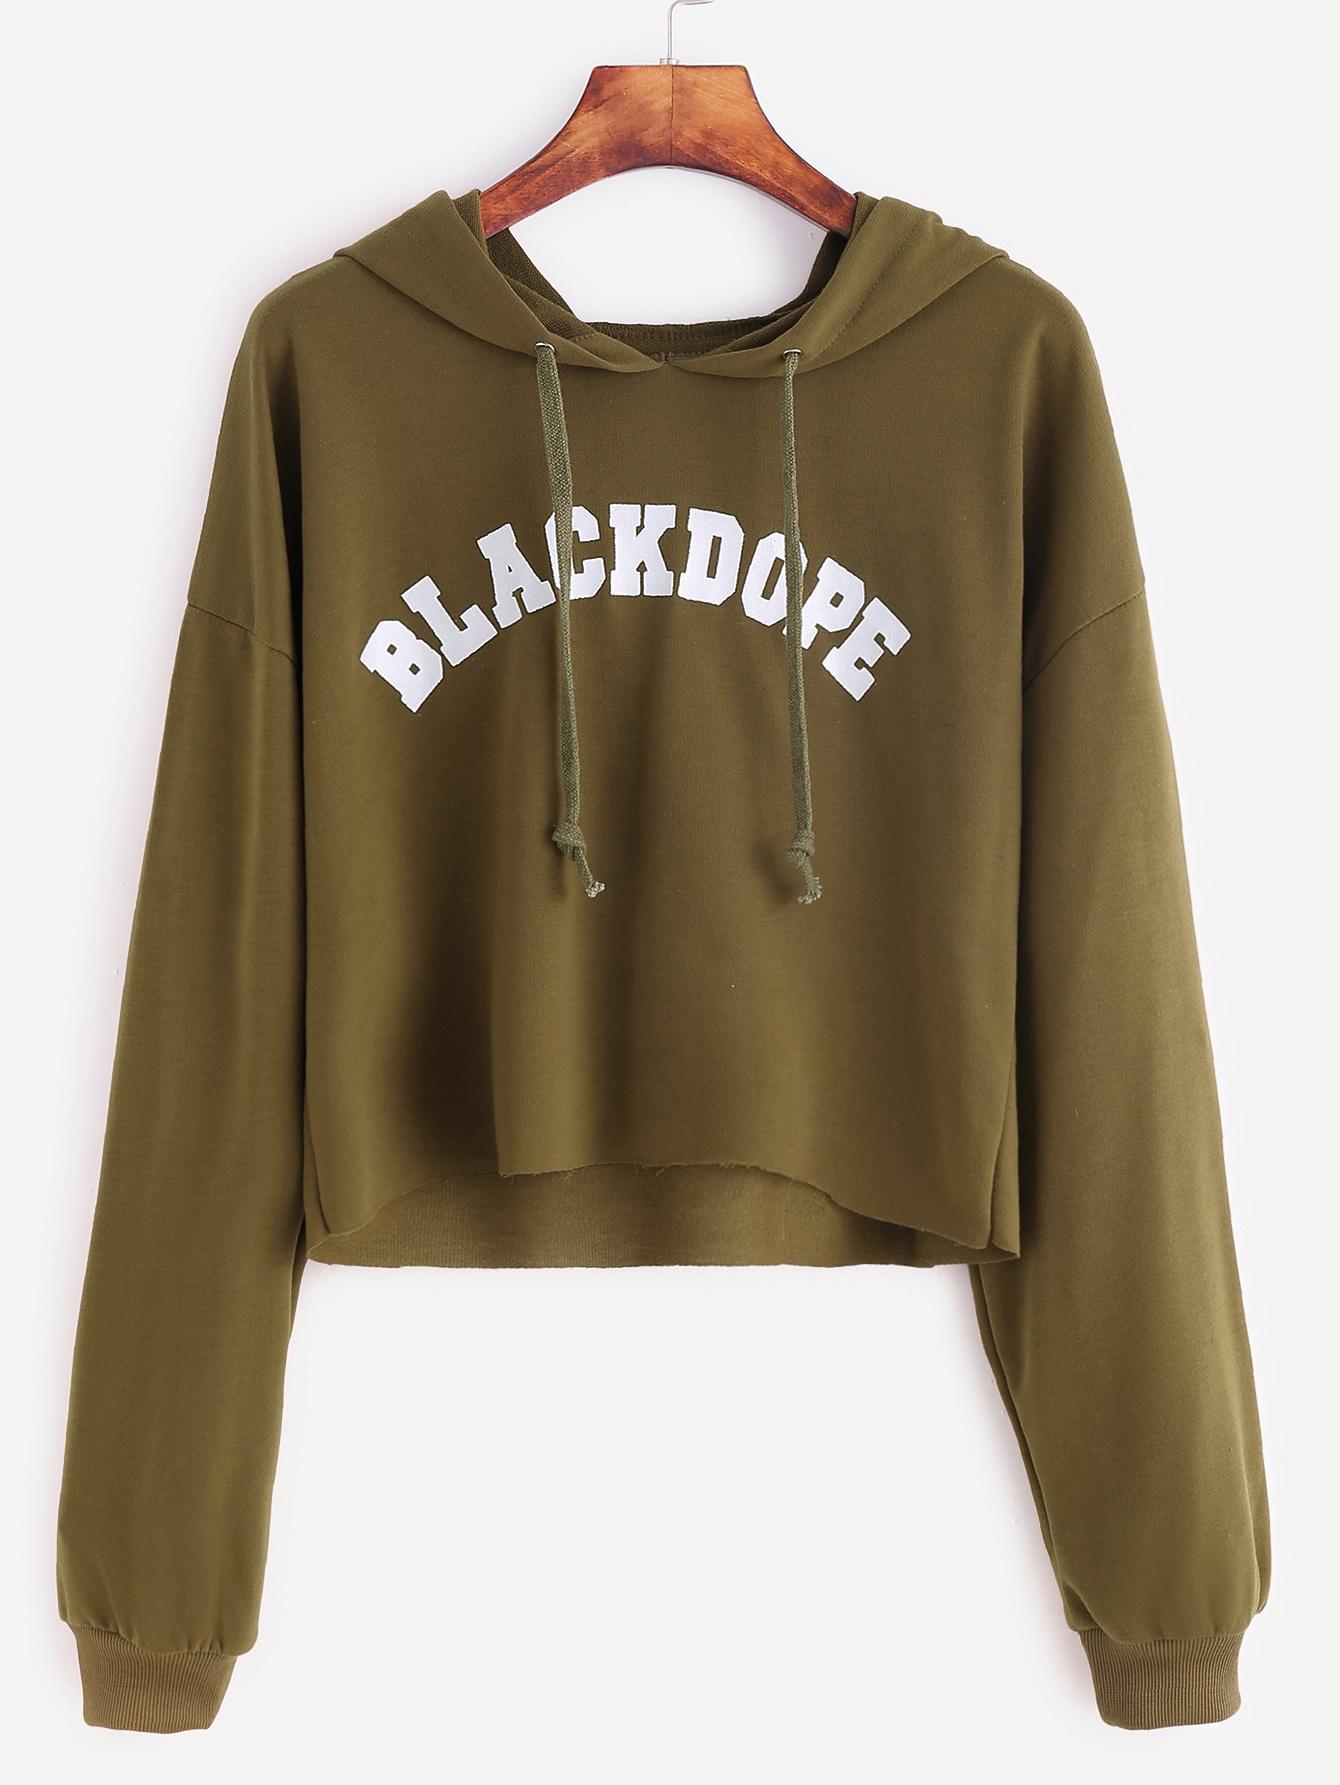 Khaki Letter Print Raw Hem Crop Sweatshirt sweatshirt161102102